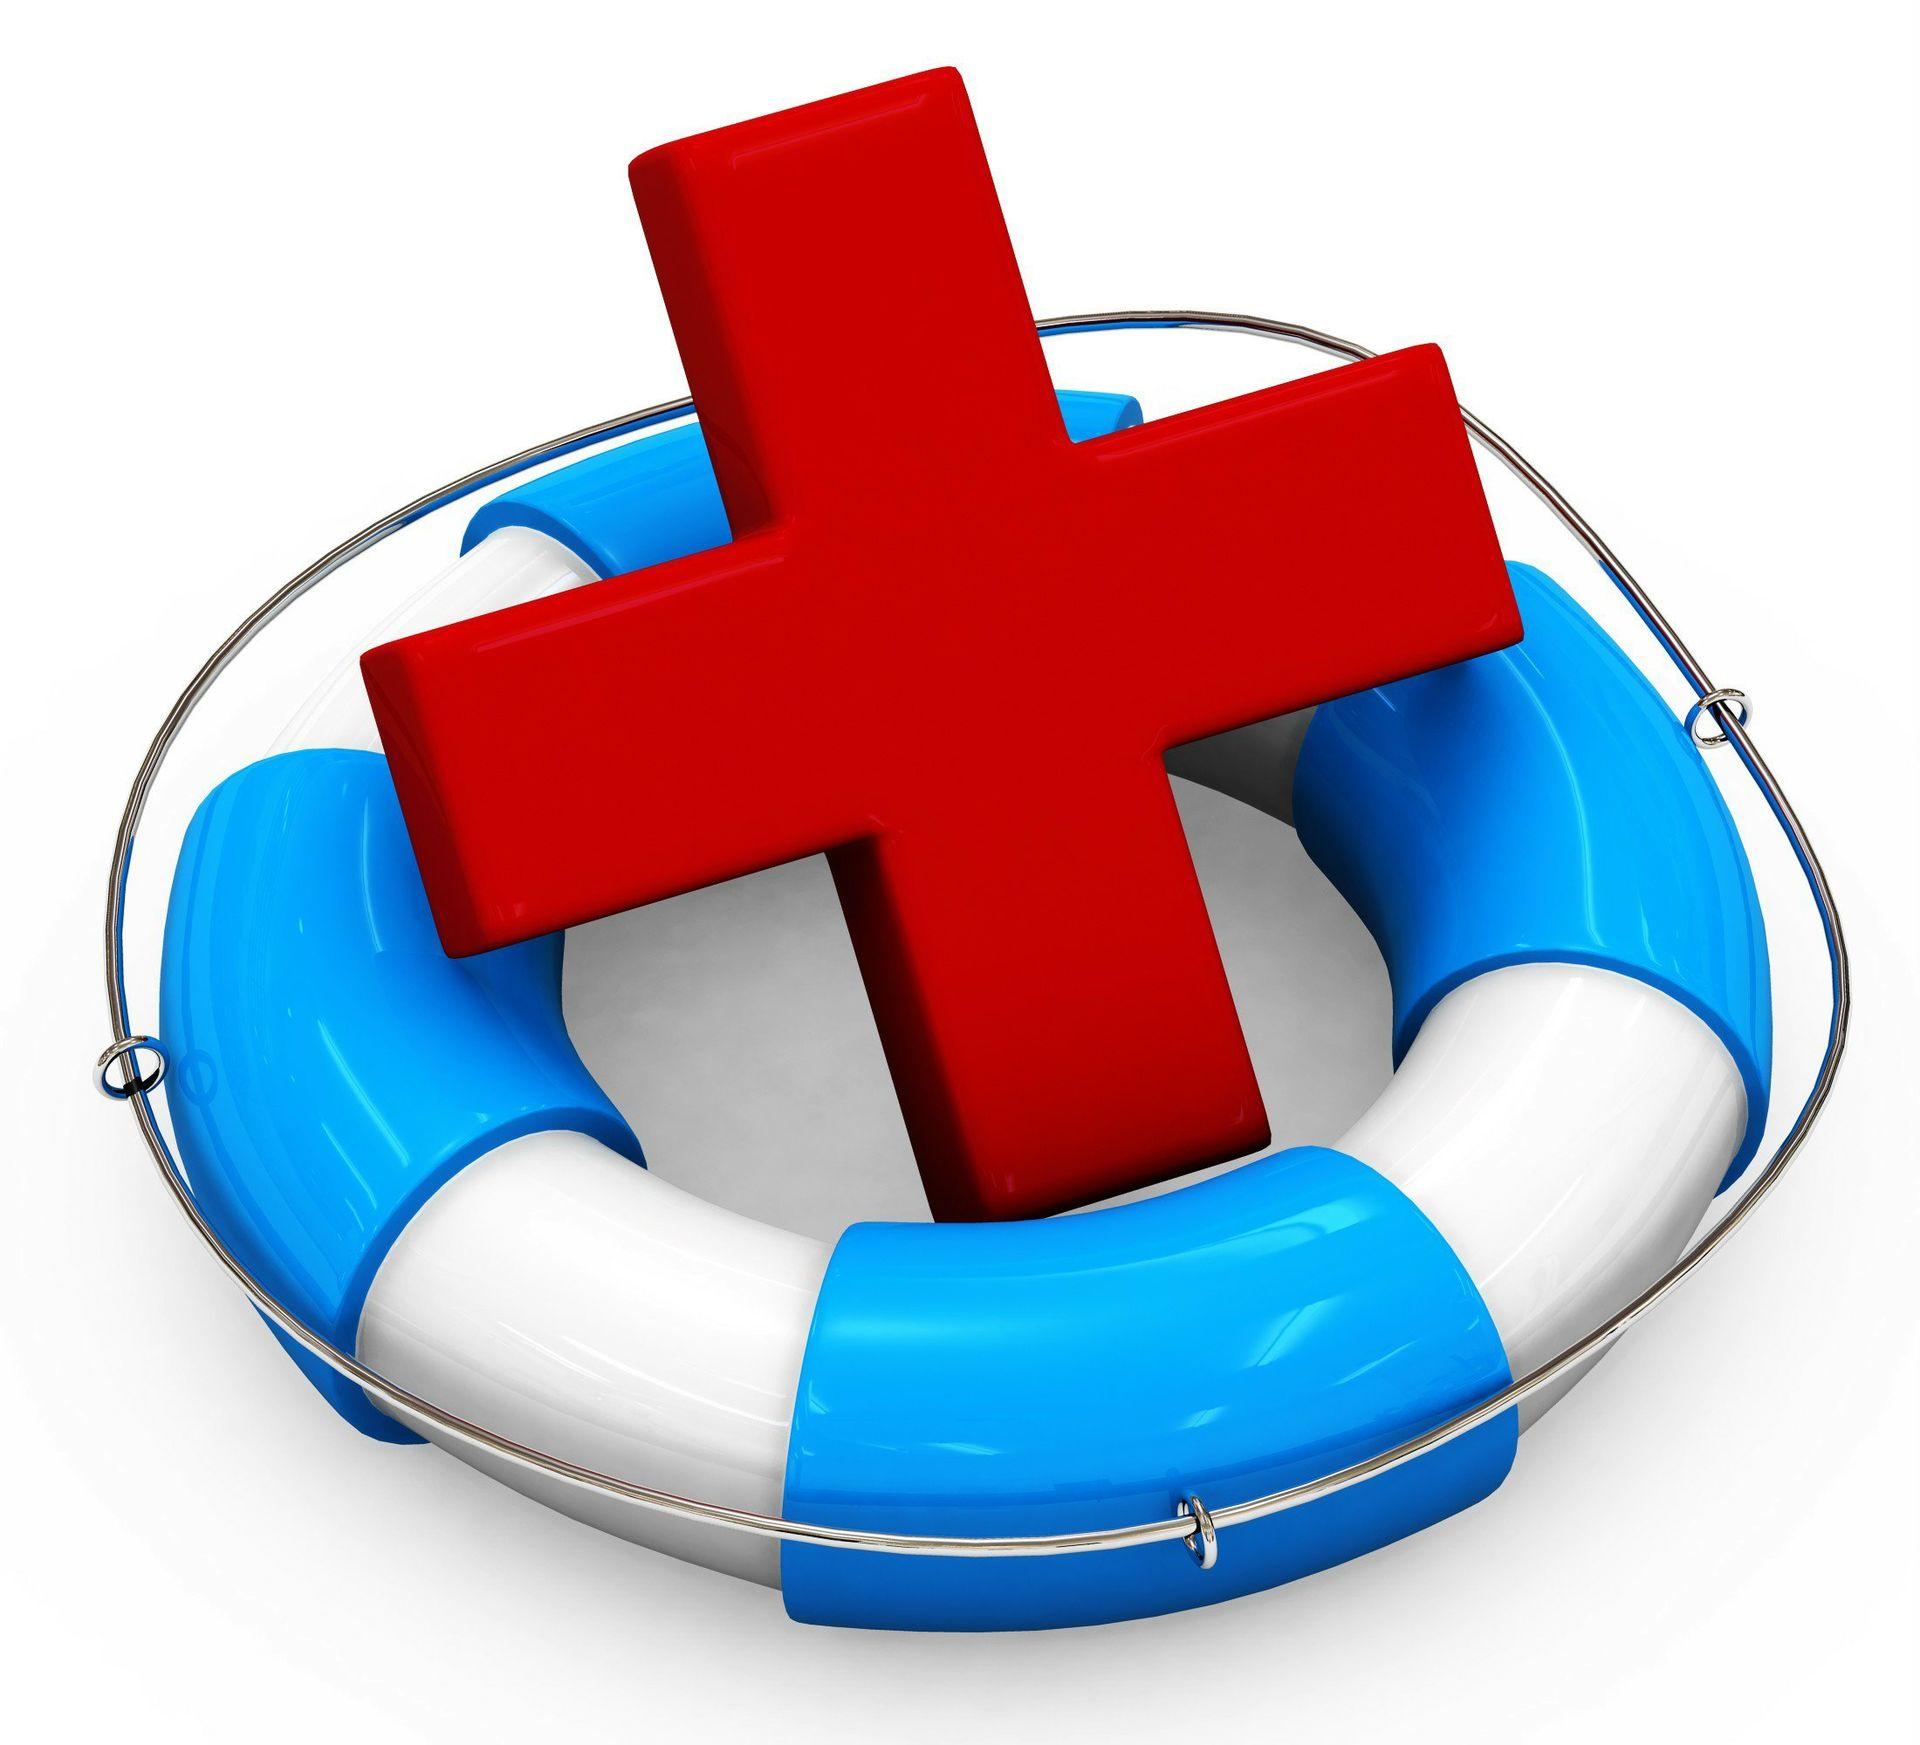 blue_white_life_saving_ring_with_medical_symbol_stock_photo_slide01-medical